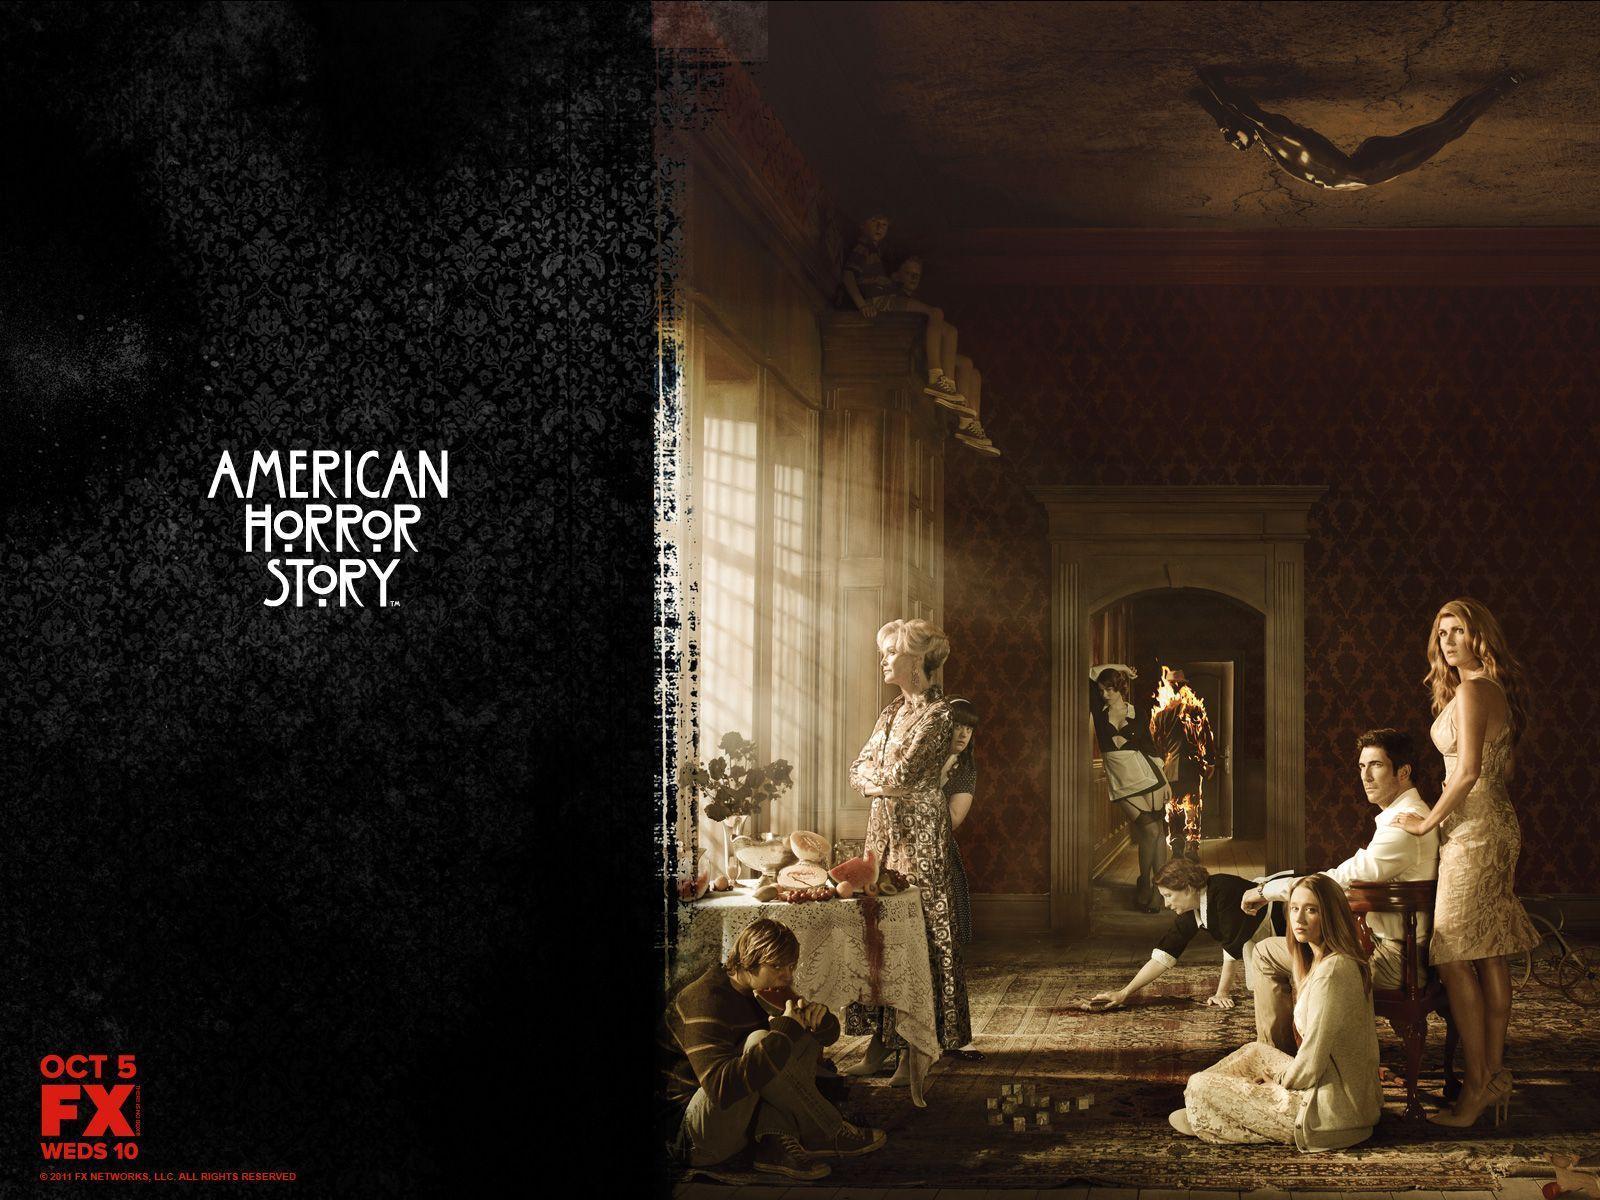 American Horror Story Wallpapers Top Free American Horror